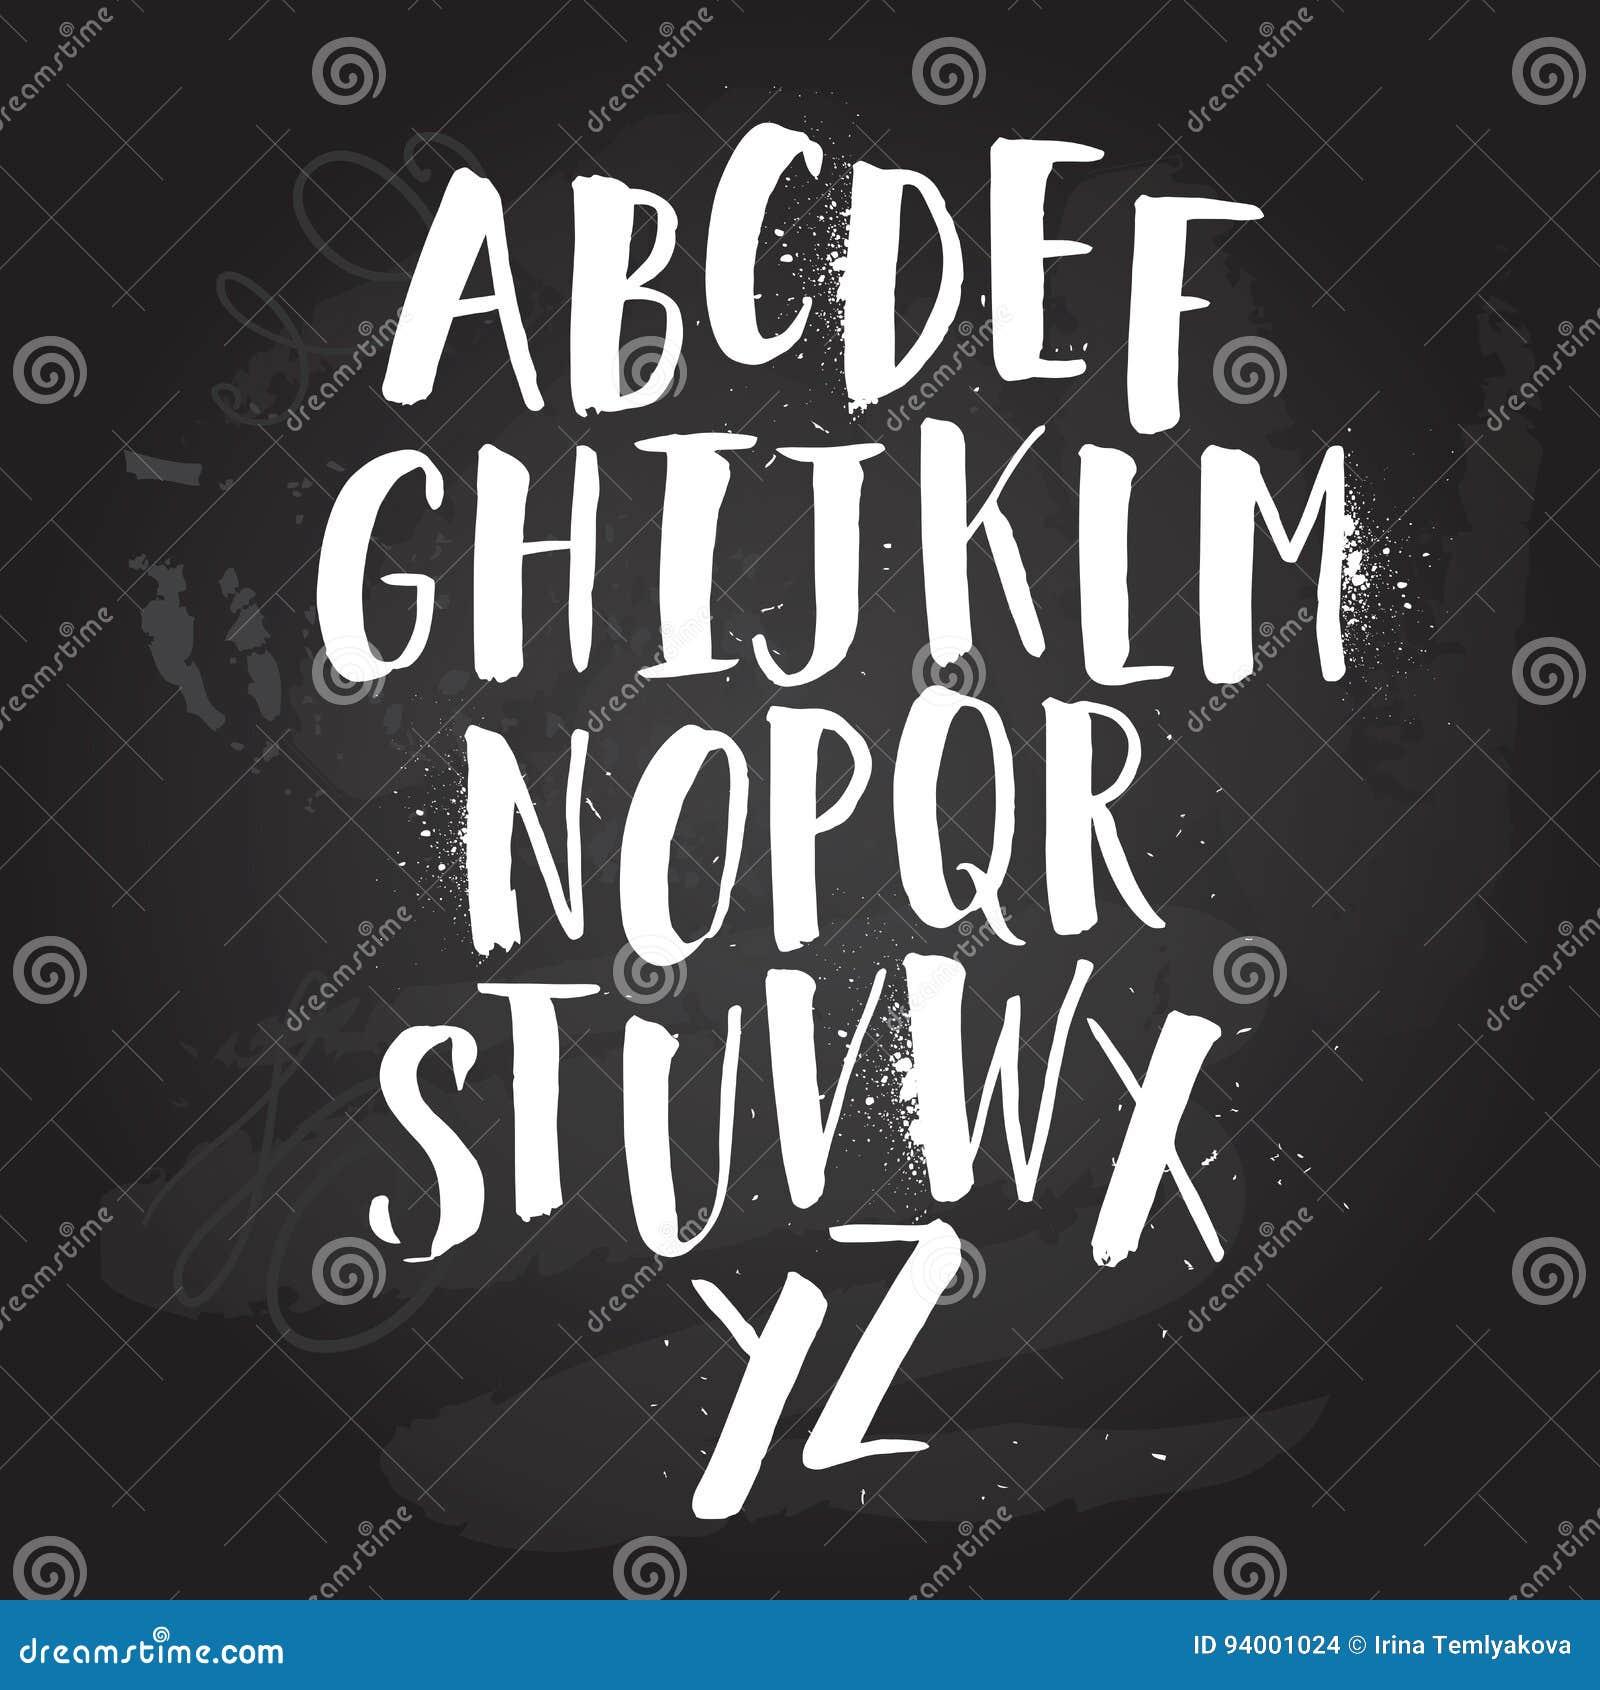 Trendy Poster Designs: Alphabet Poster, Dry Brush Ink Artistic Modern Calligraphy